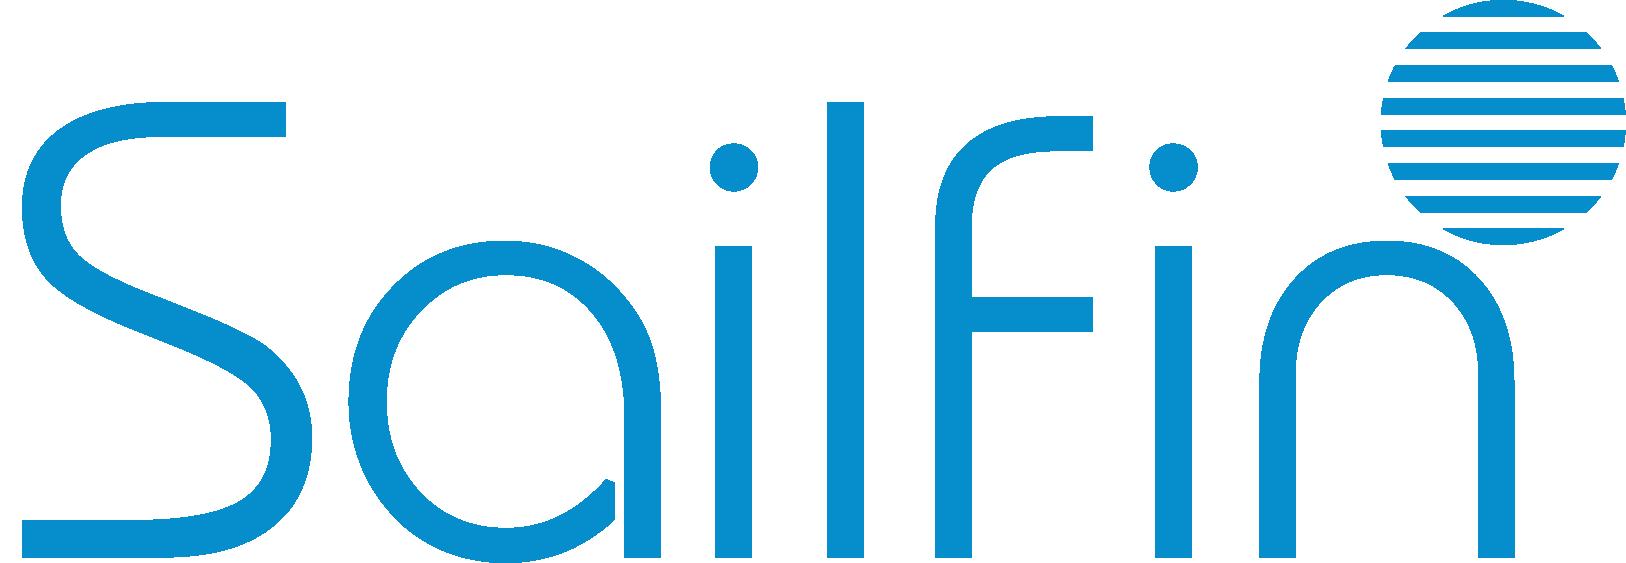 Sailfin-SRM Logo